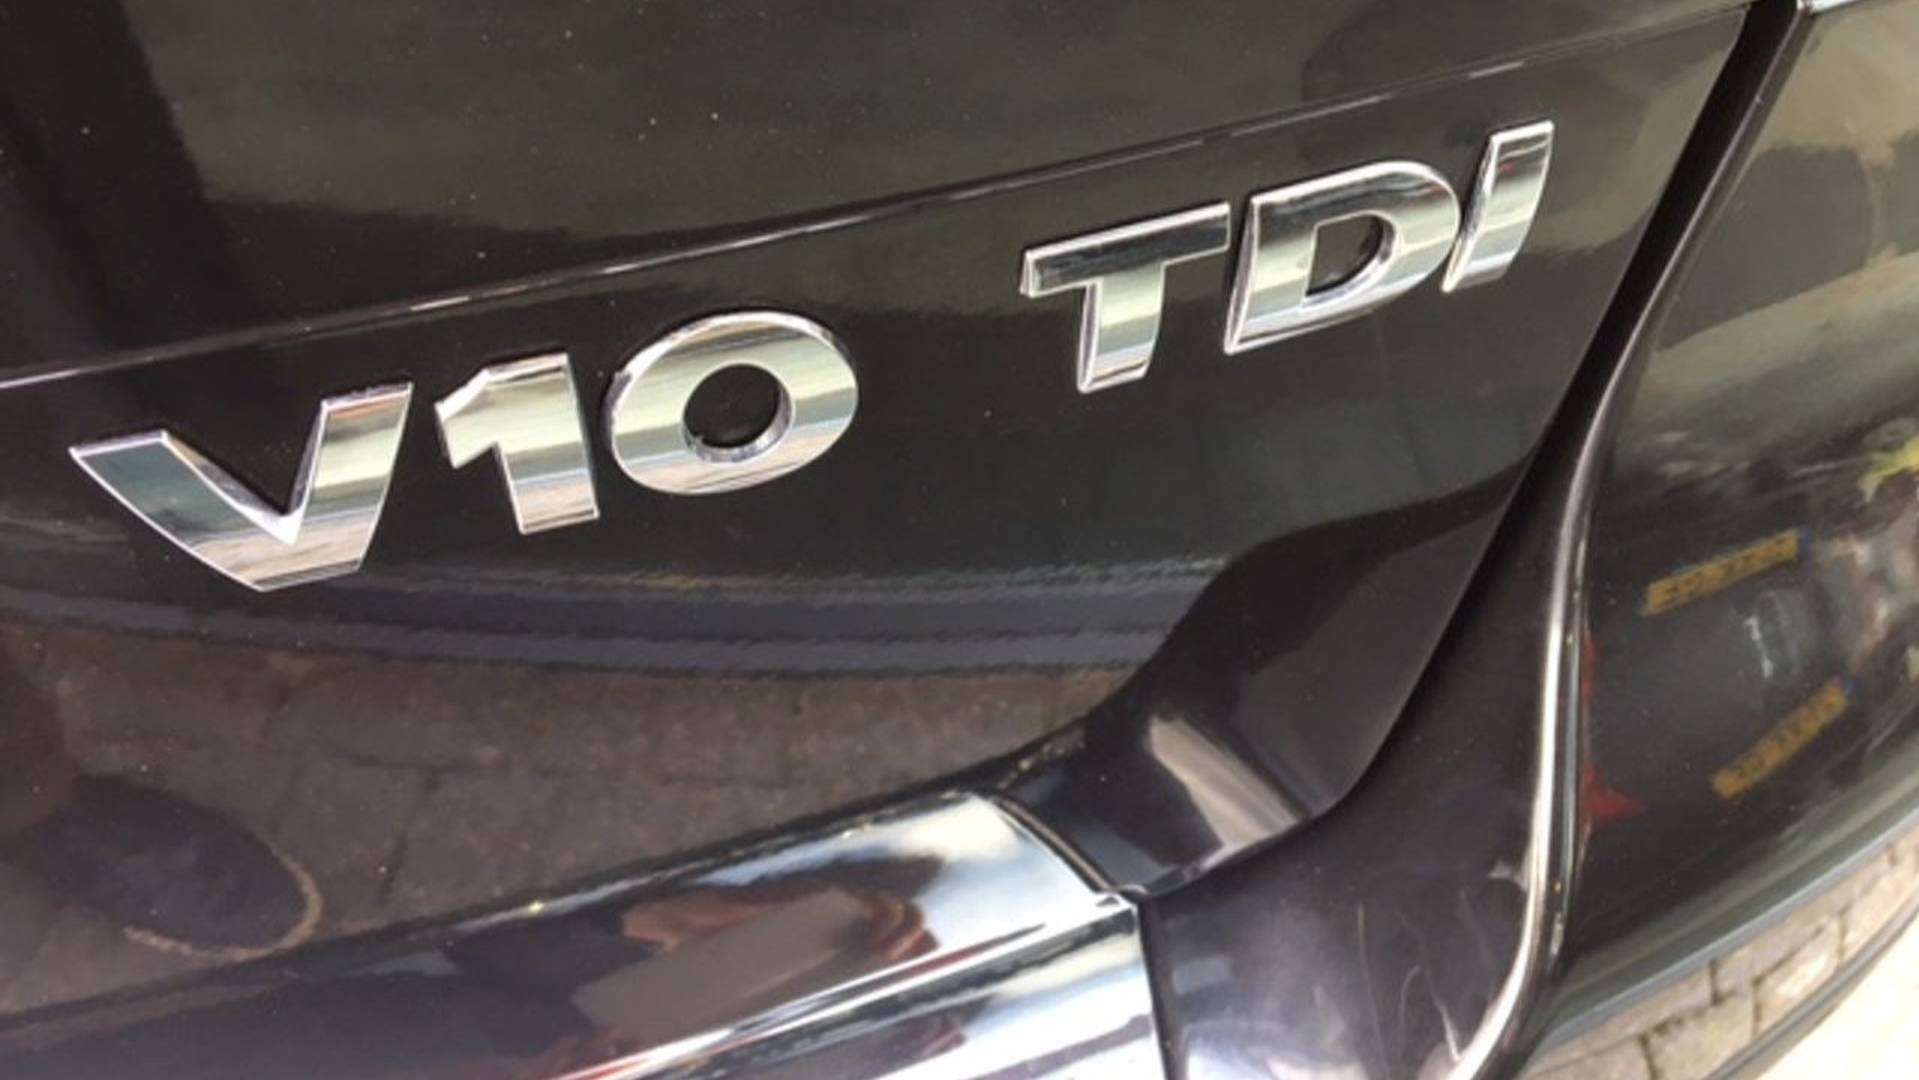 456 000 Miles Later Rare Vw Touareg V10 Tdi Is Still Trucking